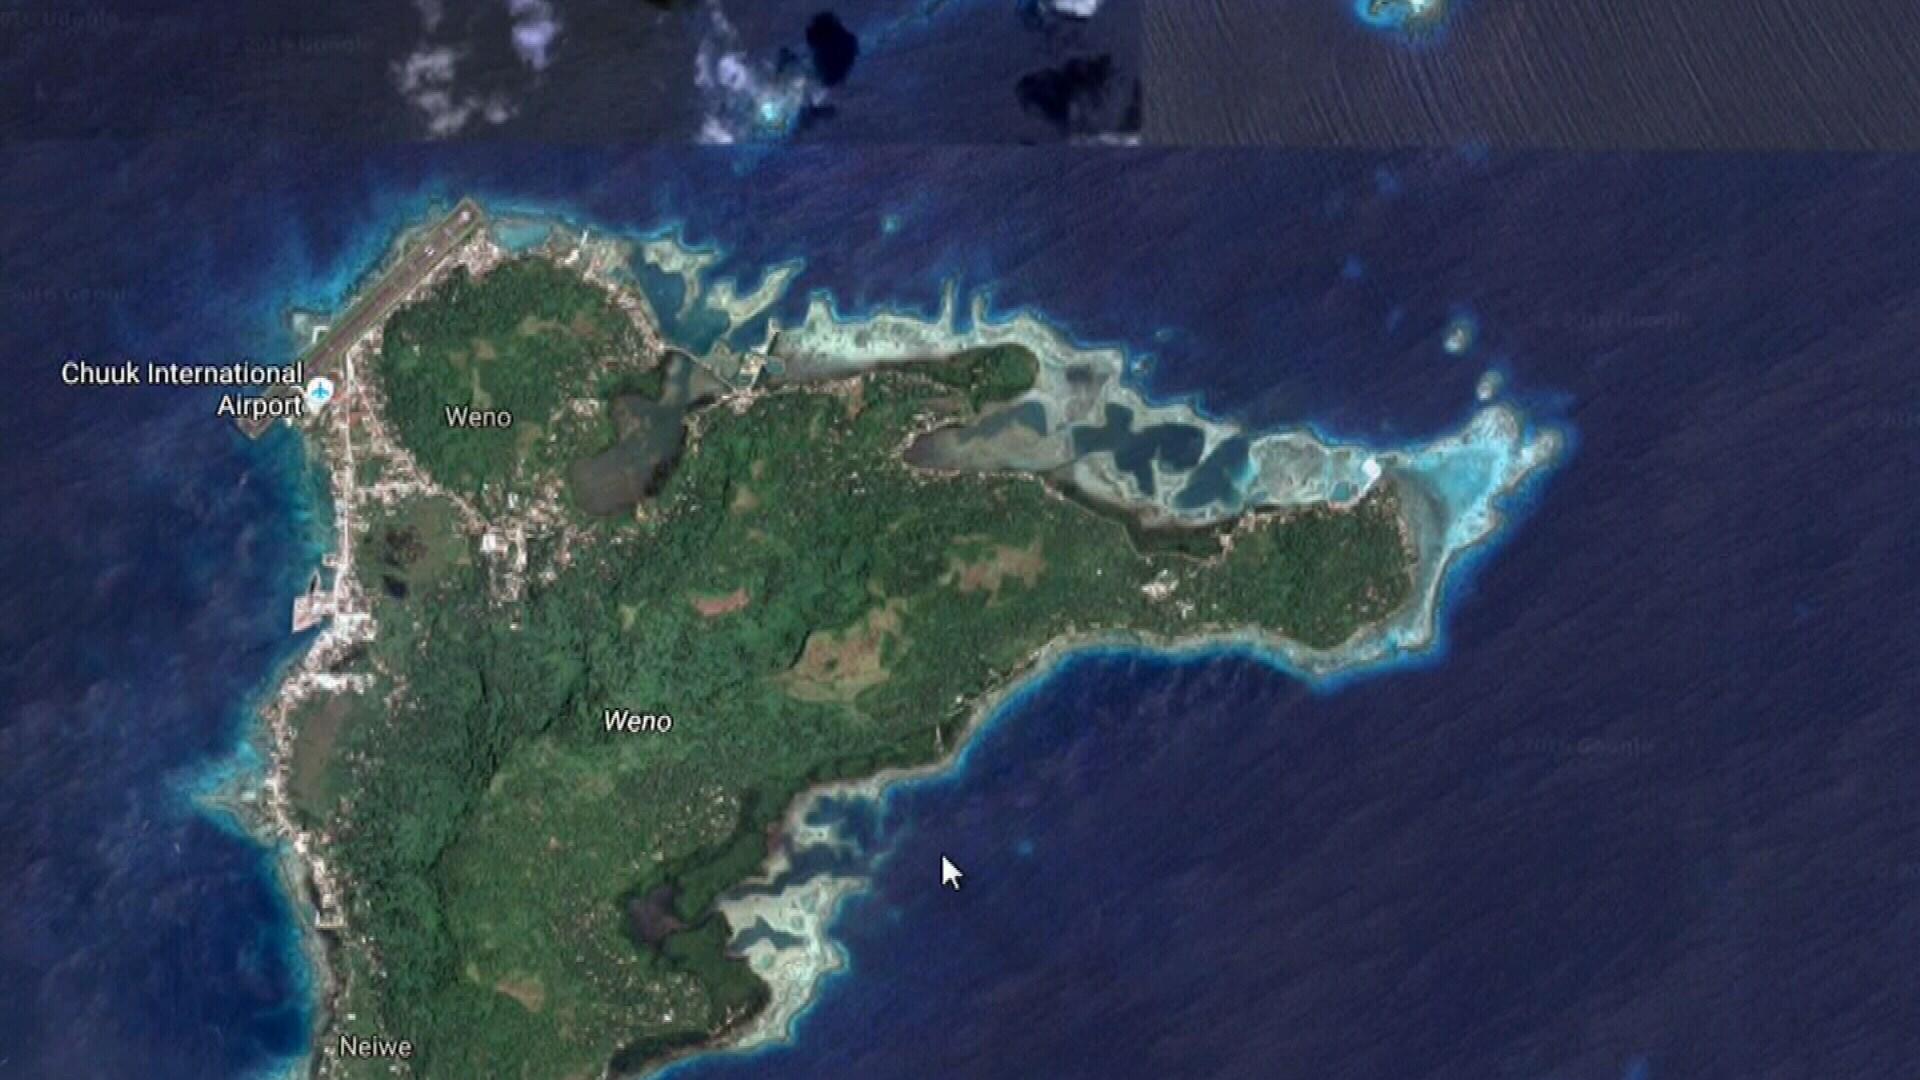 Courtesy:  Google Earth